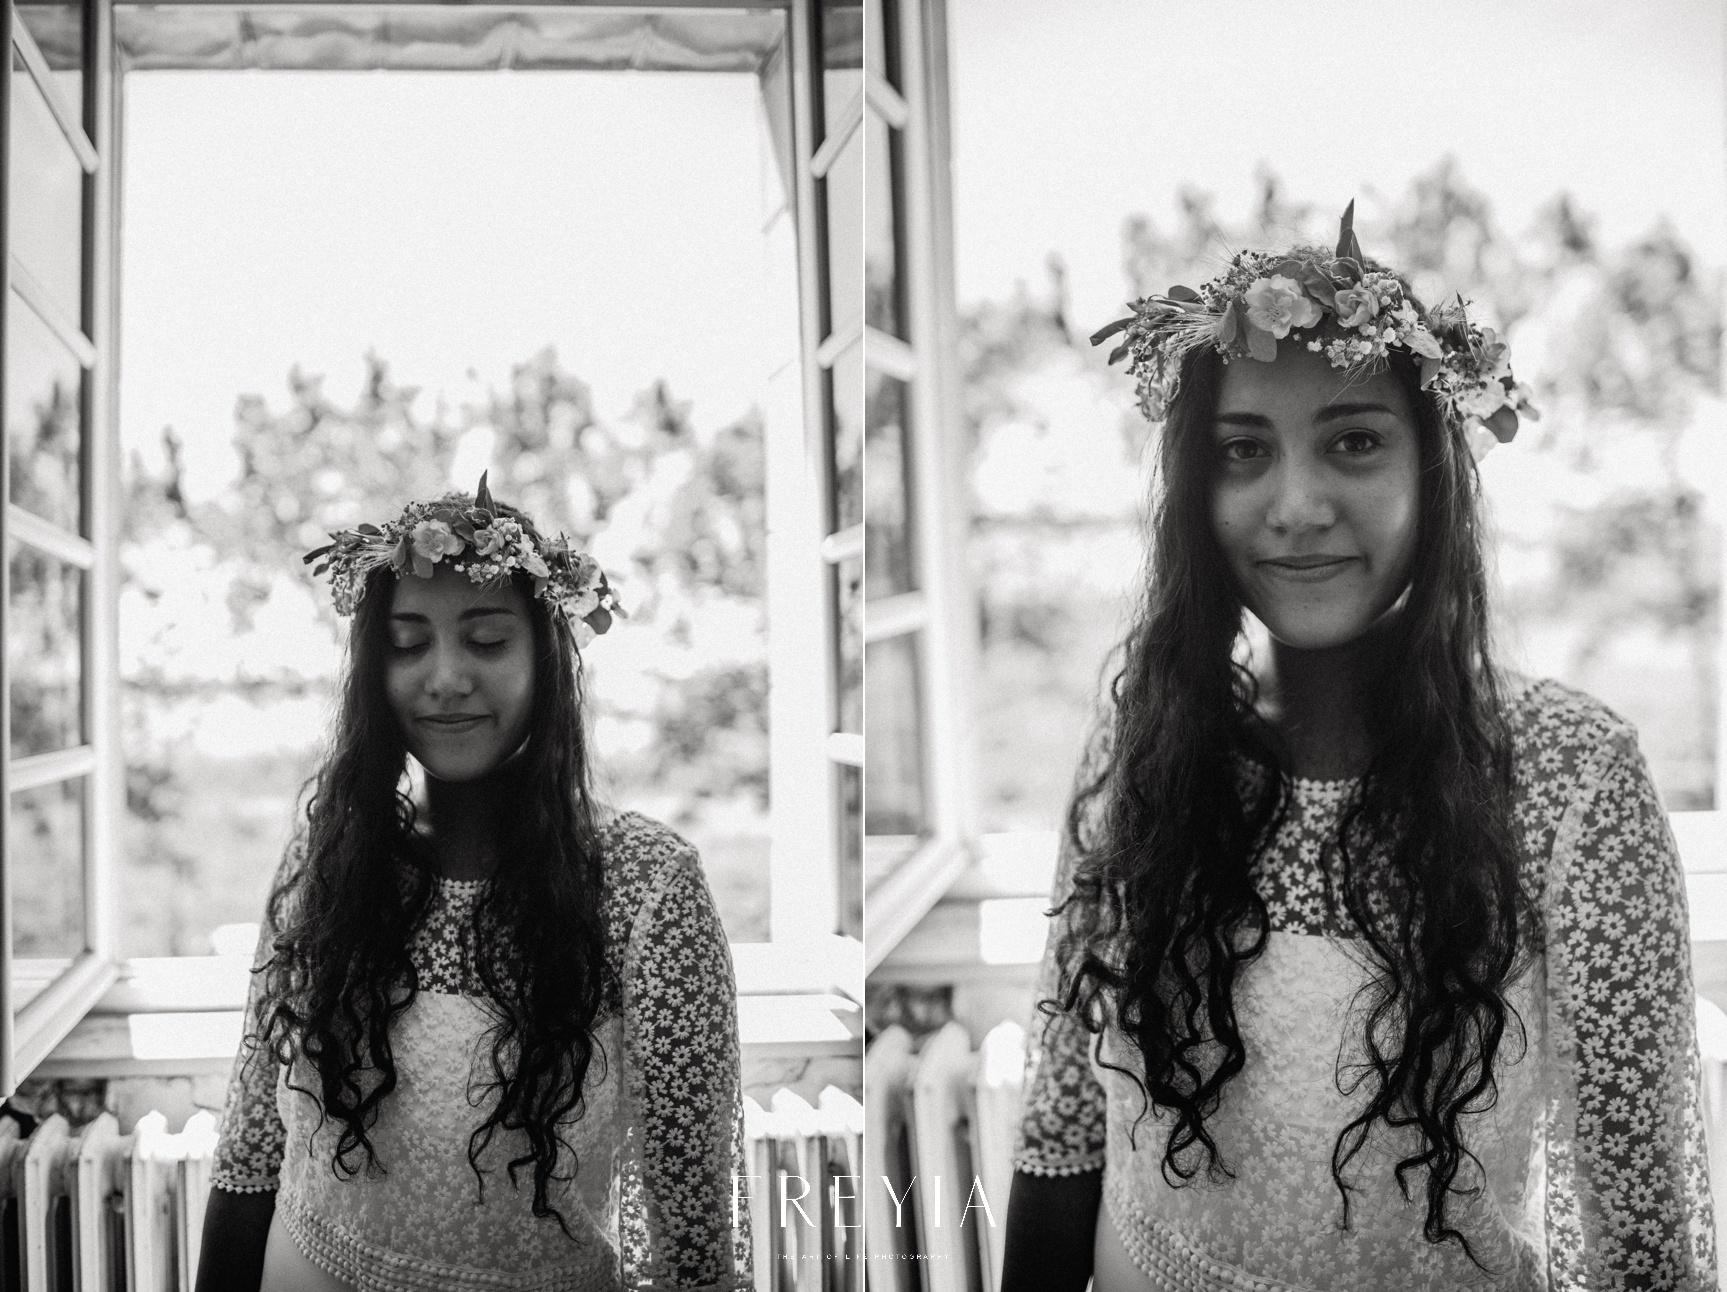 R + T |  mariage reportage alternatif moody intime minimaliste vintage naturel boho boheme |  PHOTOGRAPHE mariage PARIS france destination  | FREYIA photography_-127.jpg